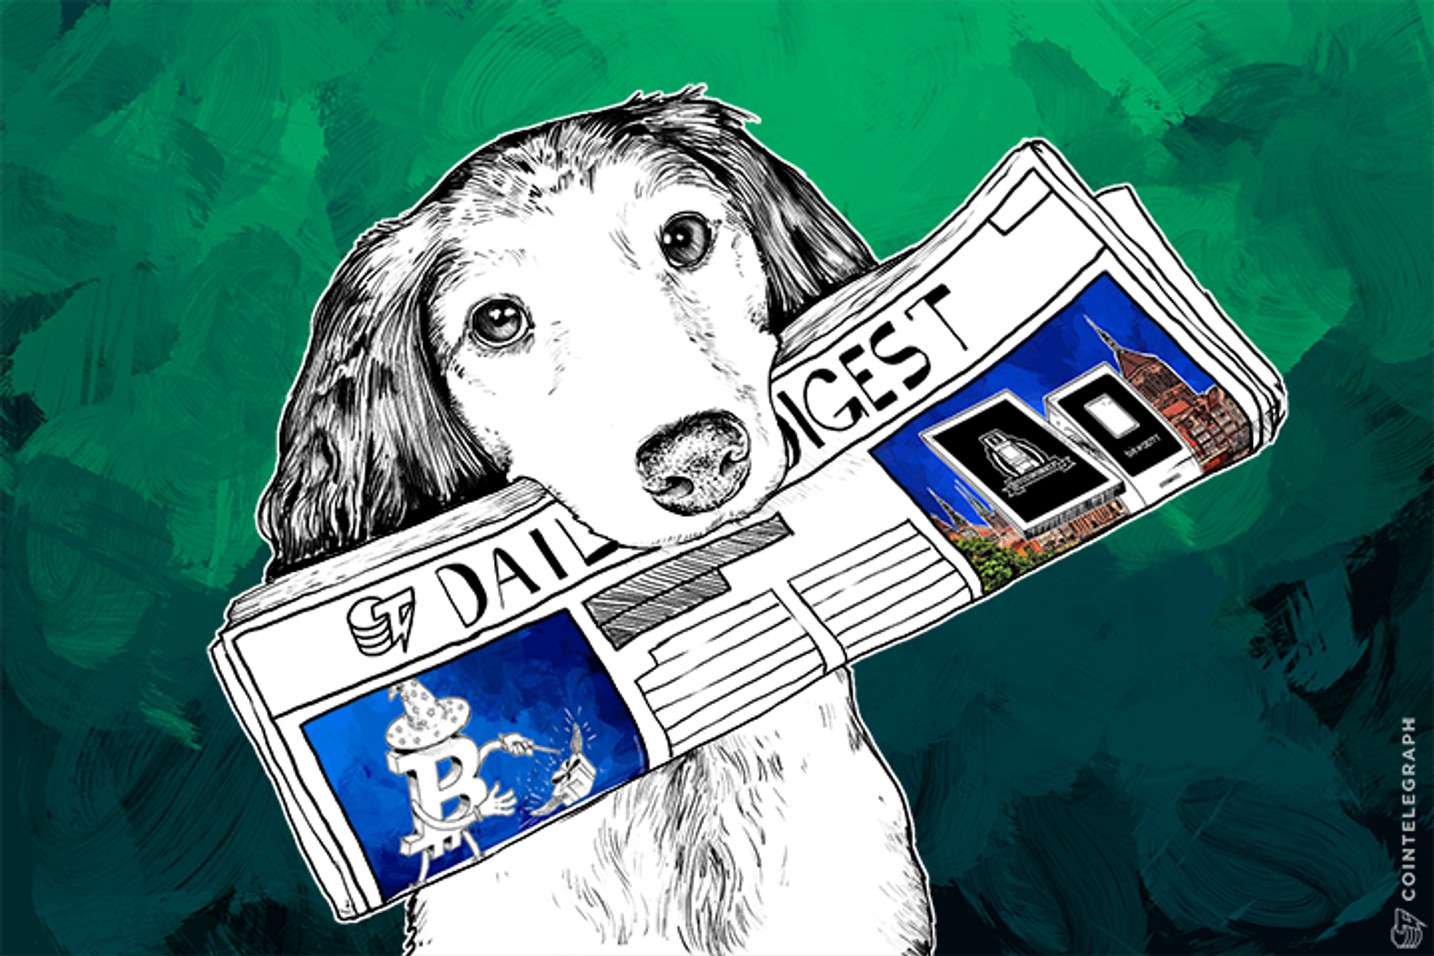 FEB 25 DIGEST: First 2-Way BTM in Poland, Tails Adds Bitcoin Wallet